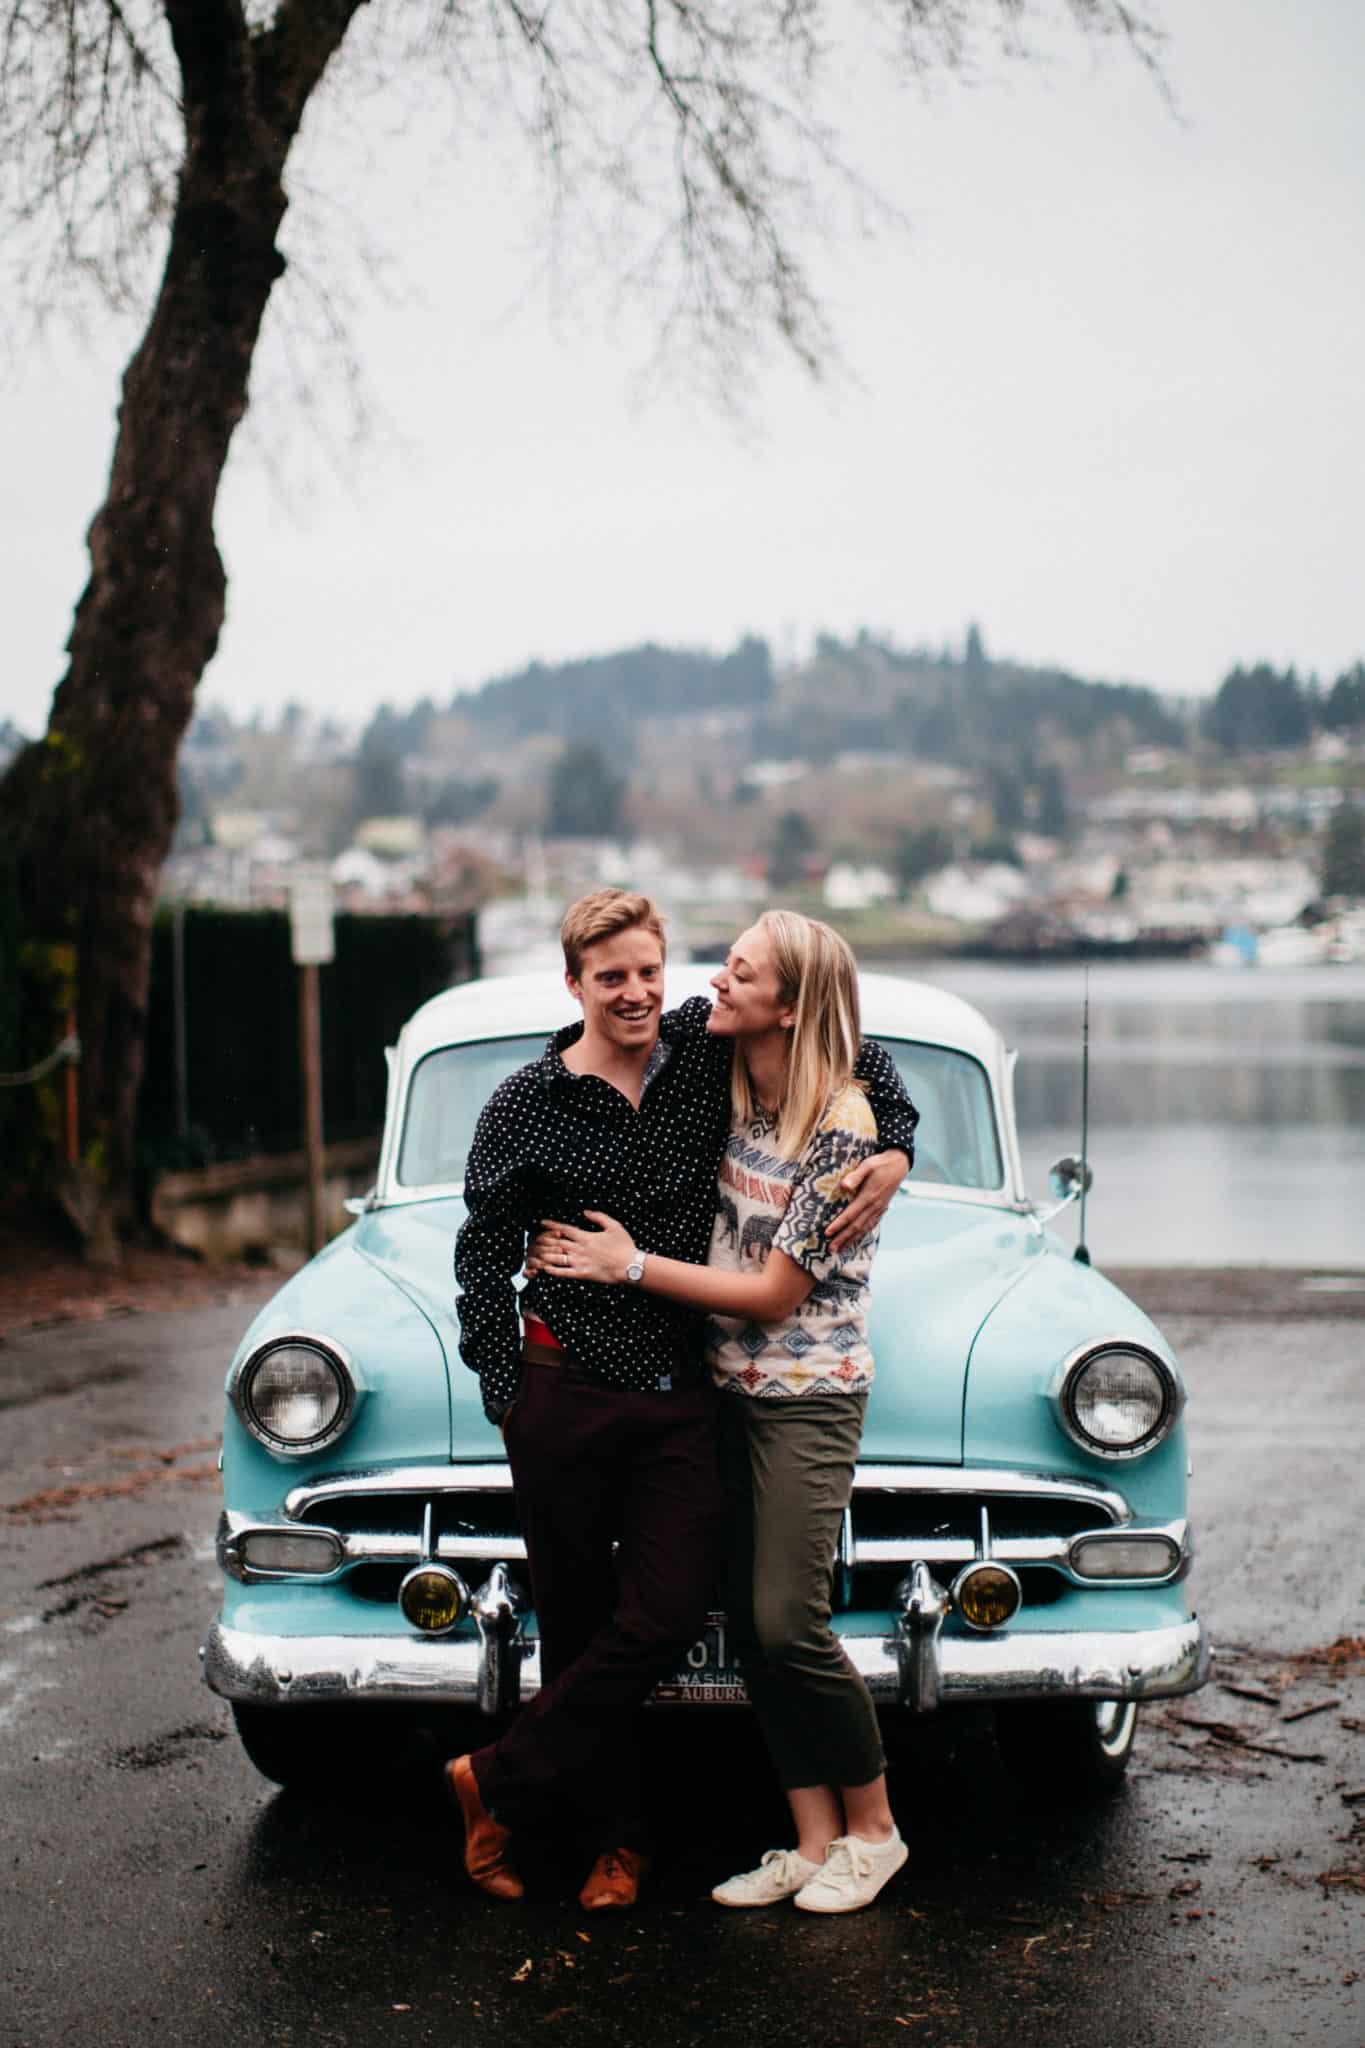 Gig Harbor, Washington - PNW Engagement shoot locations - TheMandagies.com